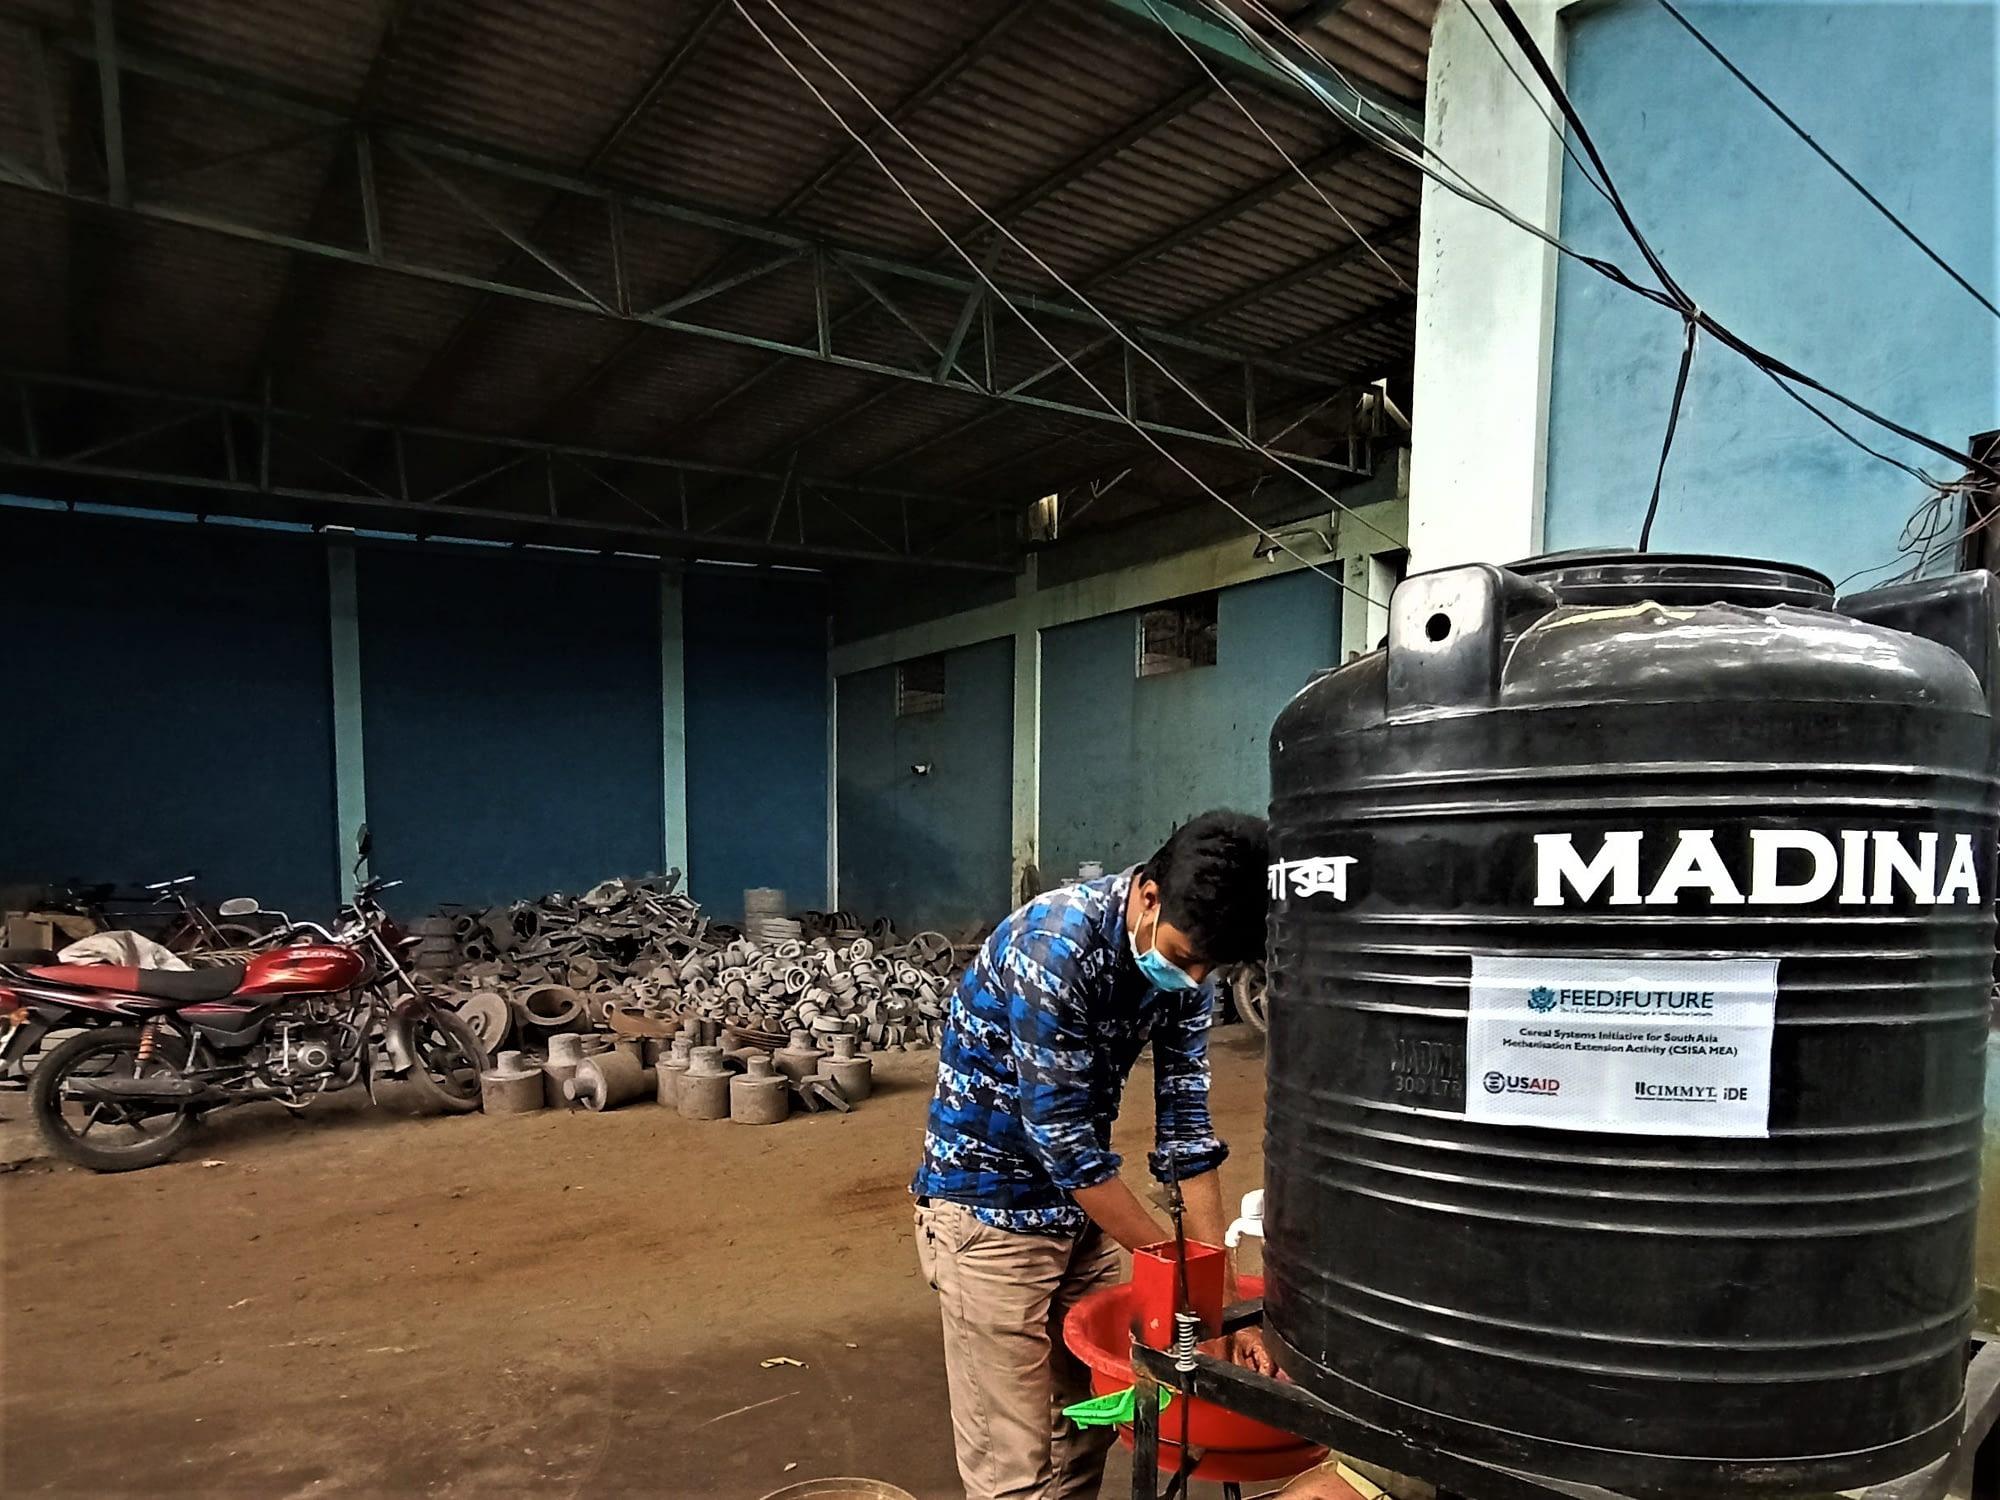 Man washes hands in workshop.